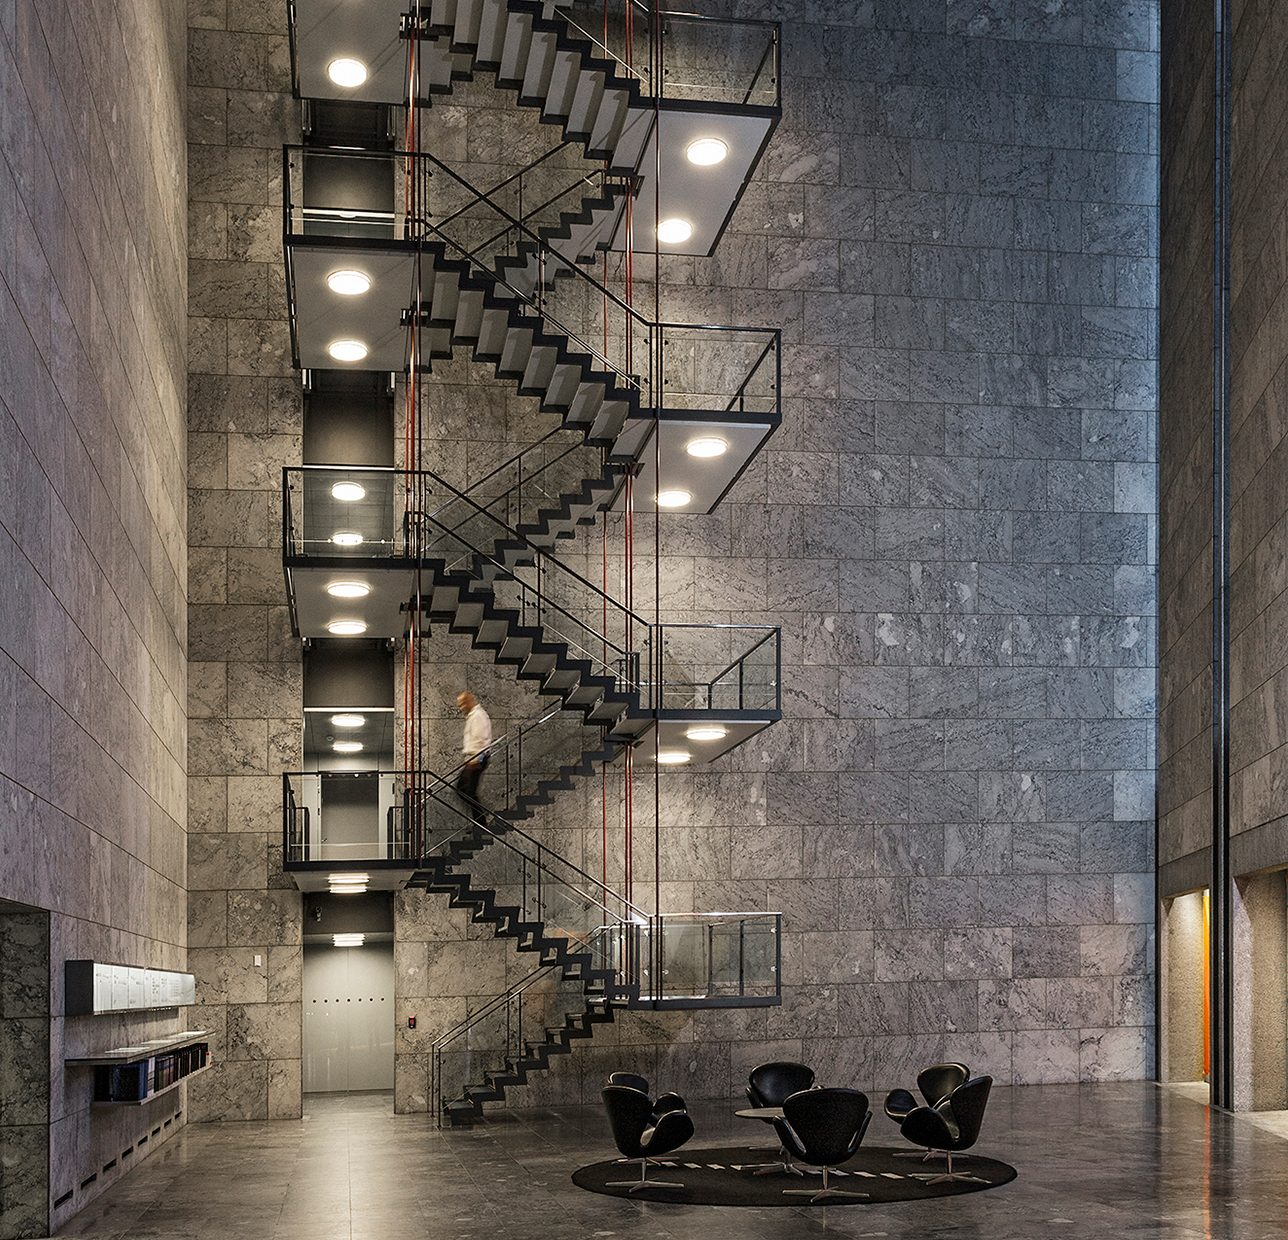 Best Arne Jacobsen Steel Stair Rodovre Town Hall Steel Stairs 400 x 300